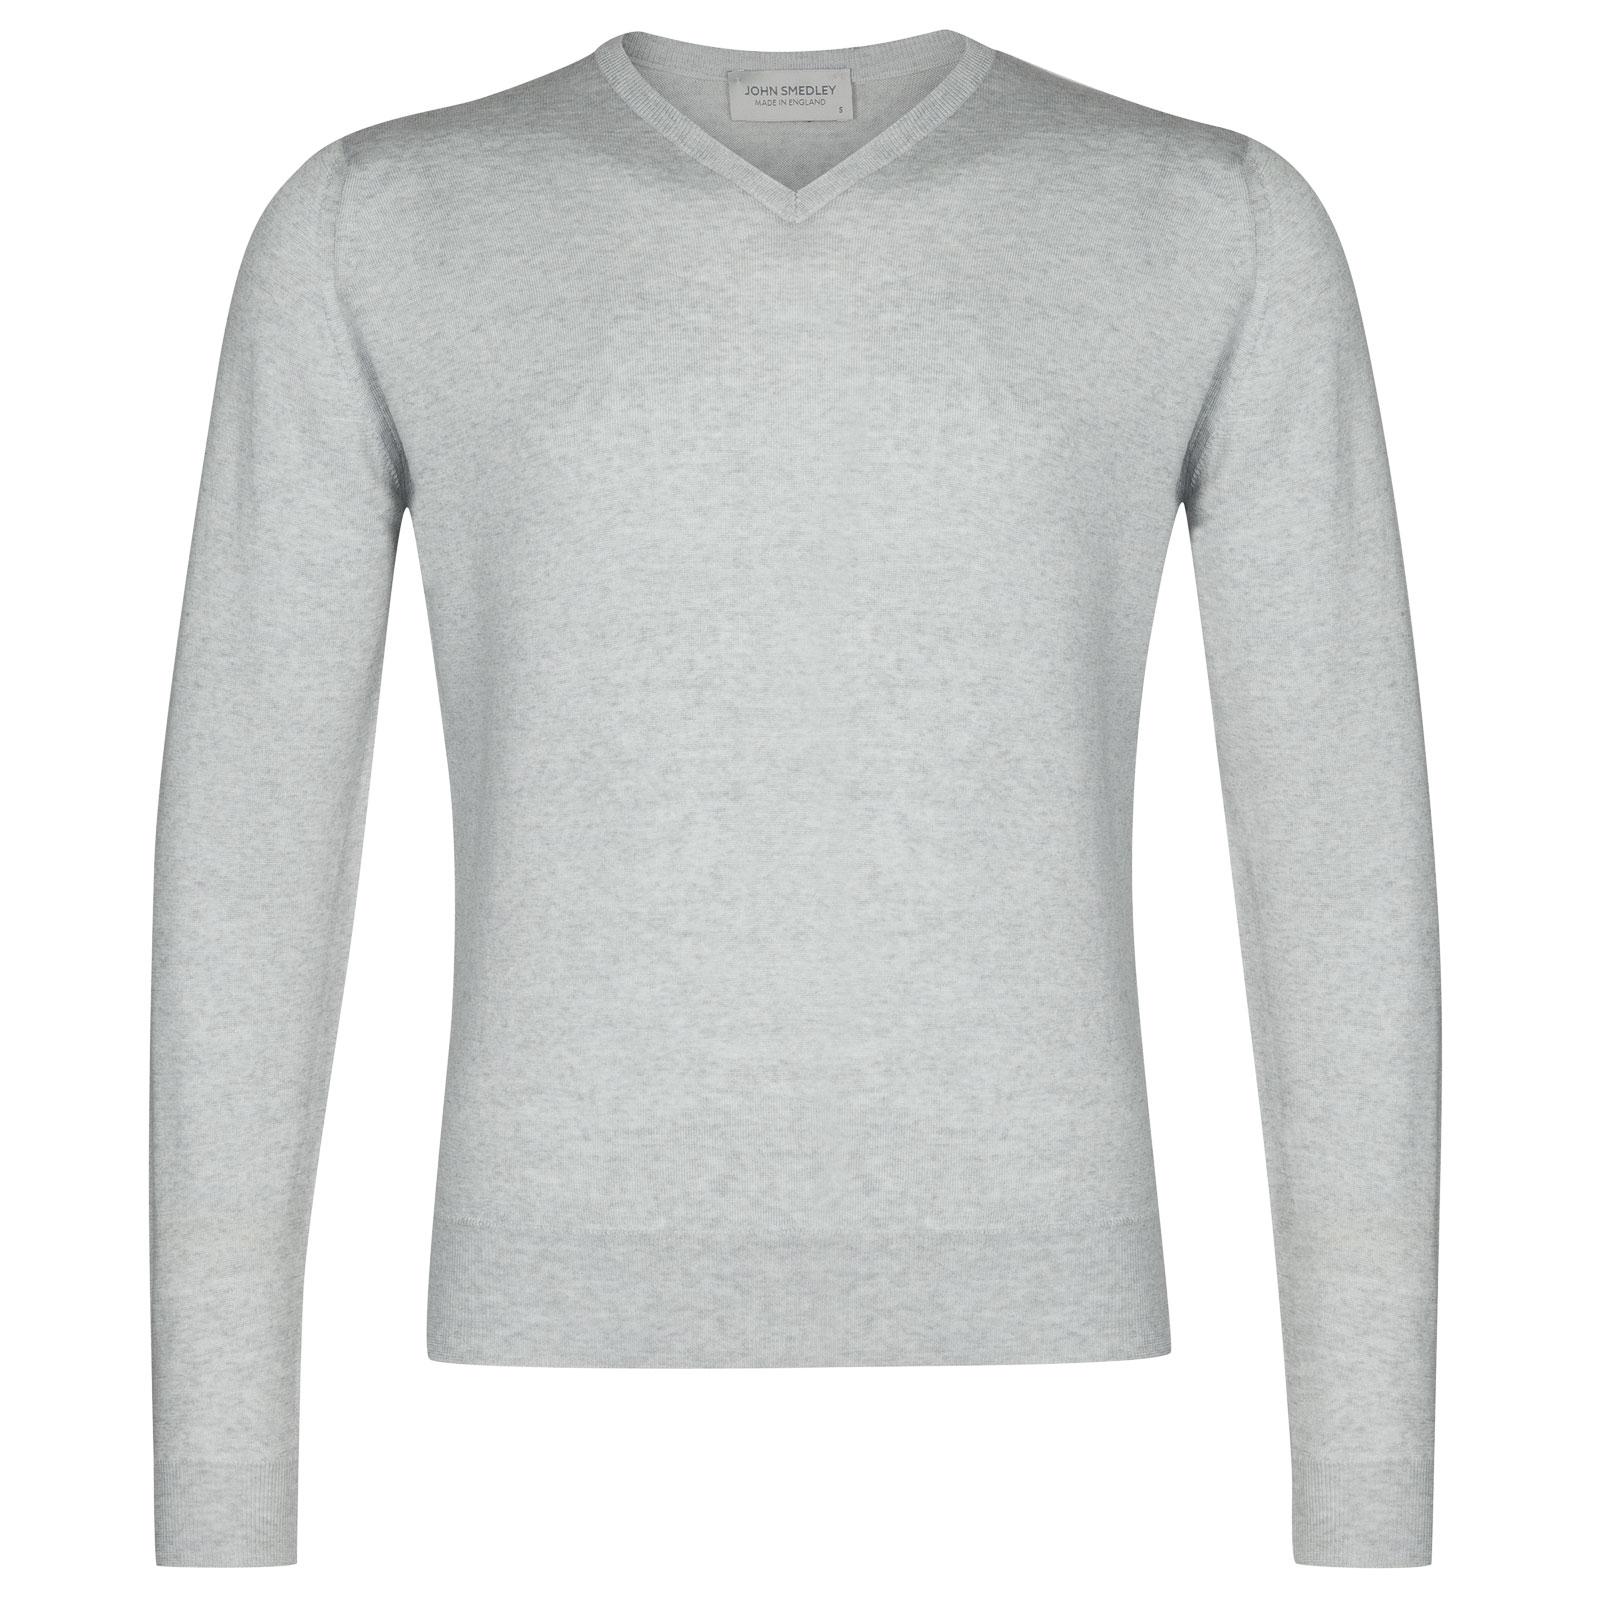 John Smedley genoa Merino Wool Pullover in Bardot Grey-S